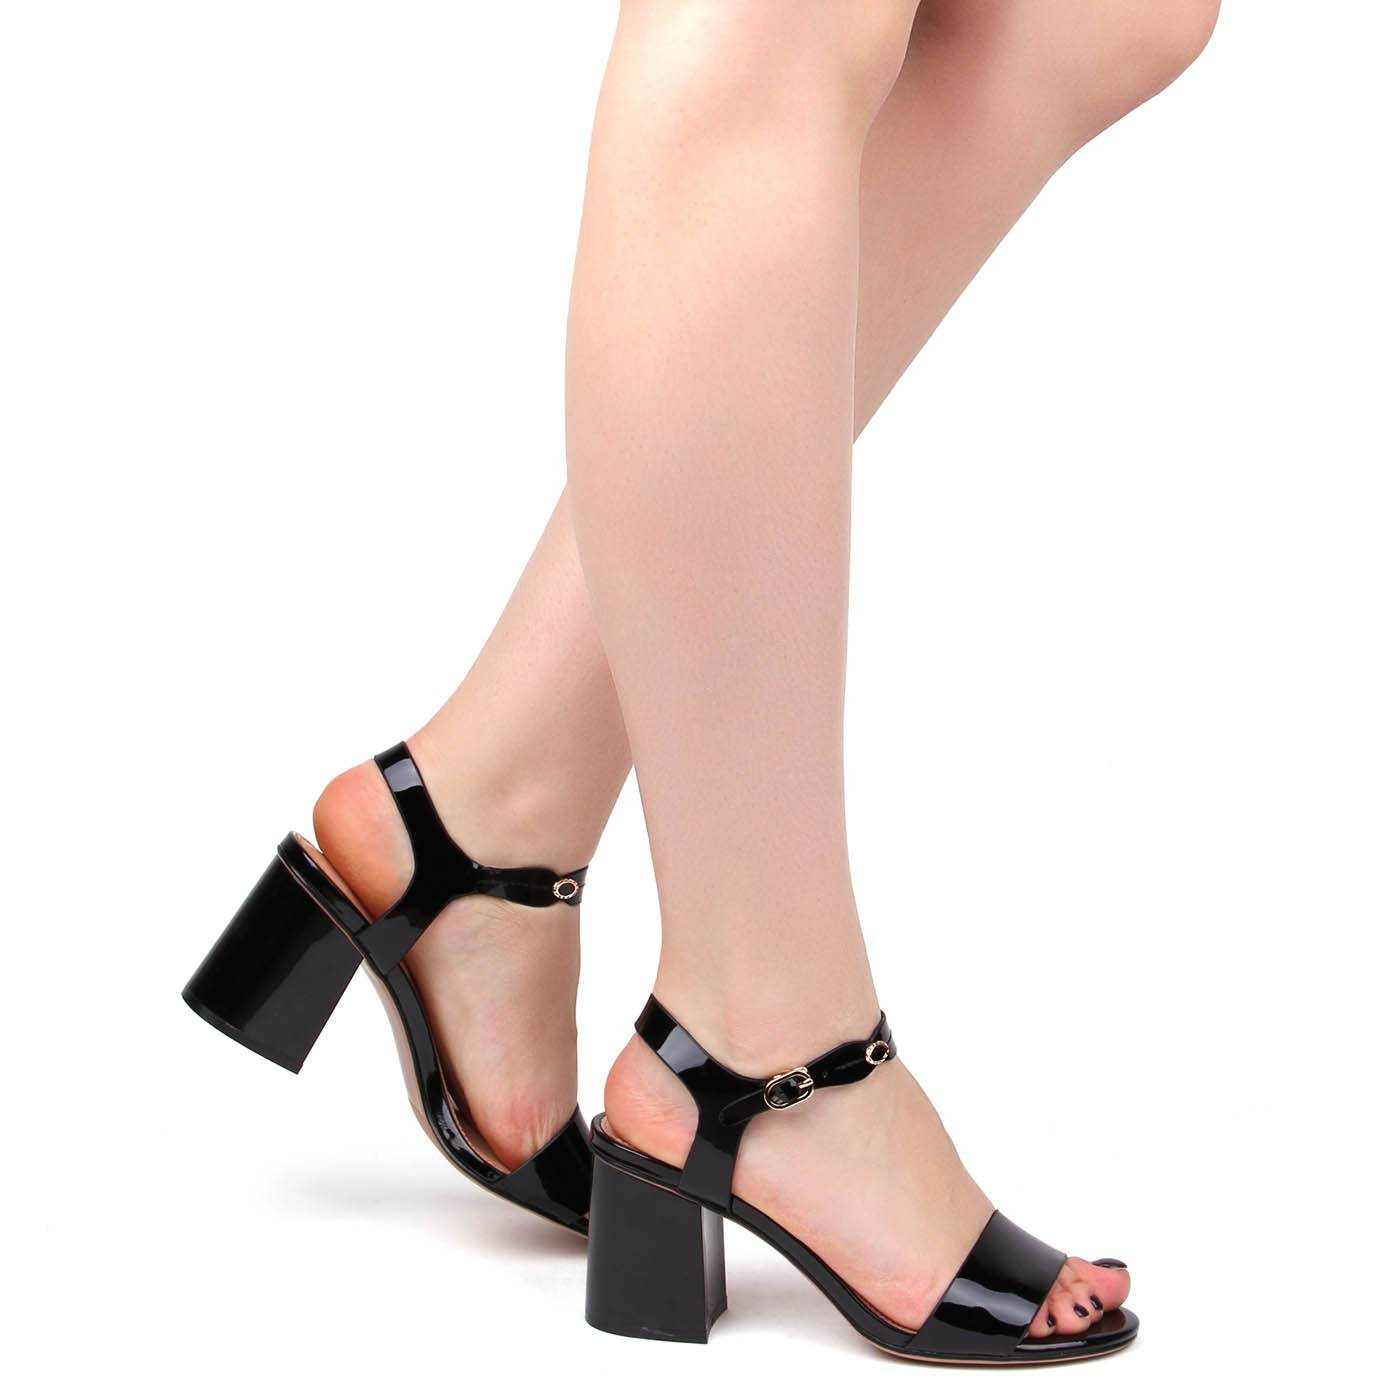 Босоніжки жіночі ditto 6426 Чорний купить по выгодной цене в ... 443ecd1c466f1